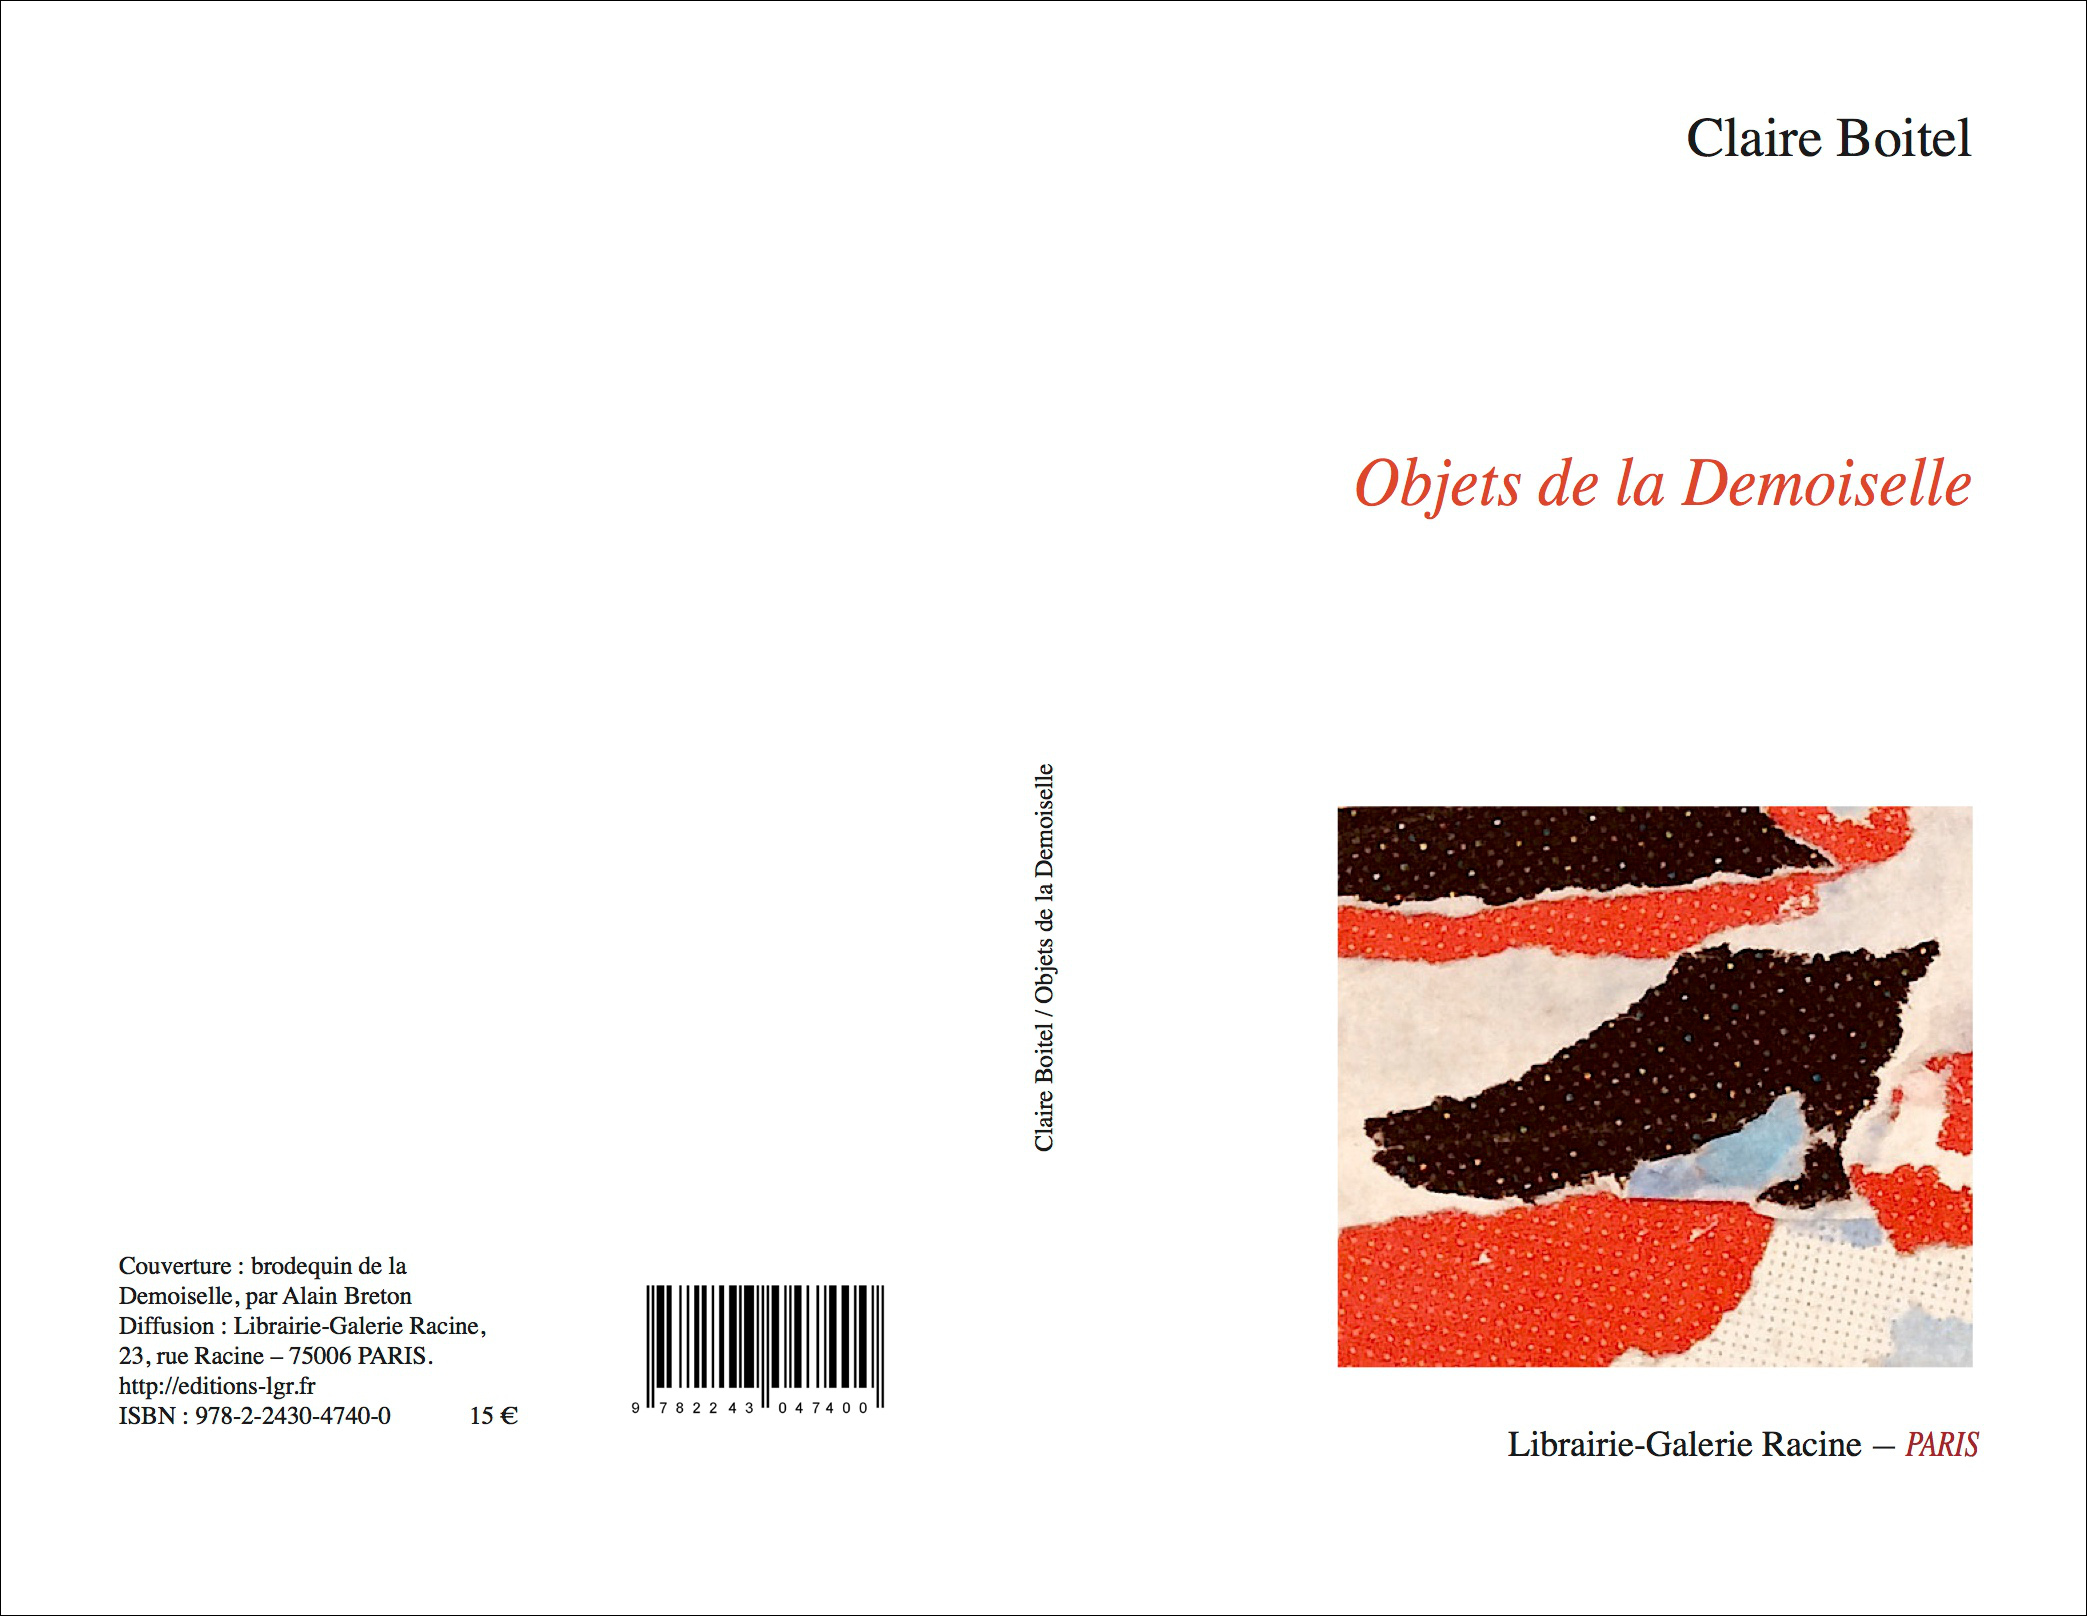 Claire BOITEL - Objets de la Demoiselle